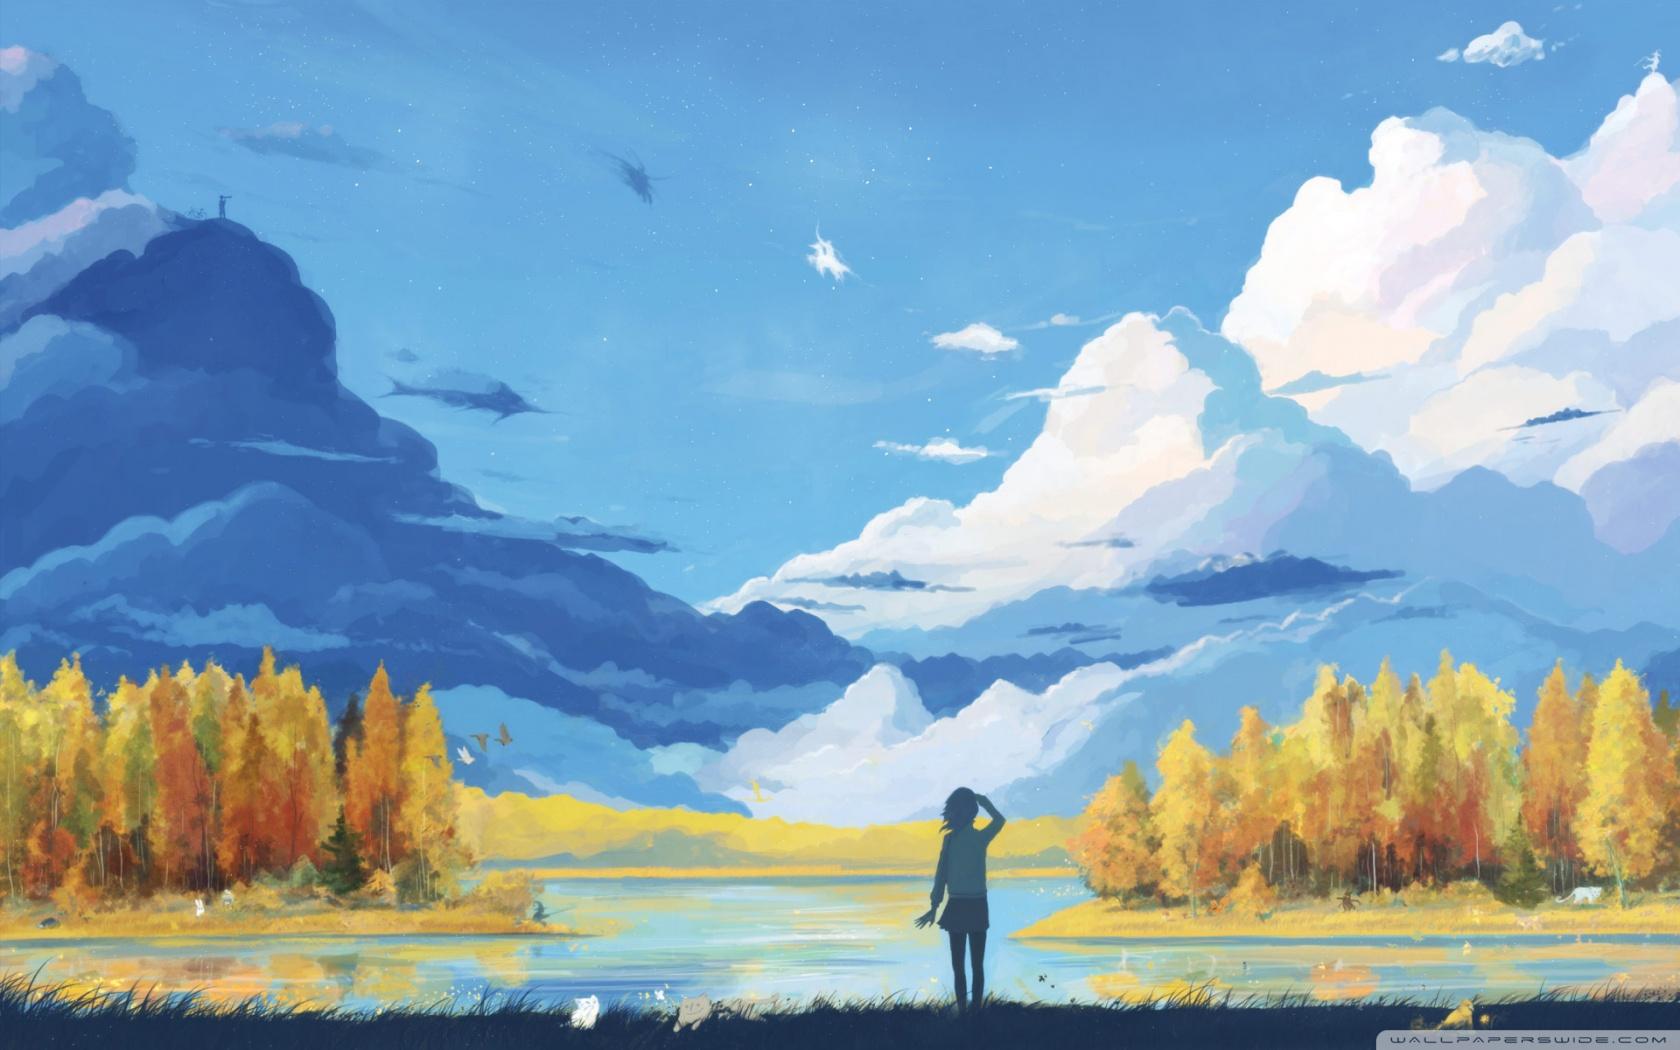 Drawn scenic senary Wallpaper : Painting Definition Fall